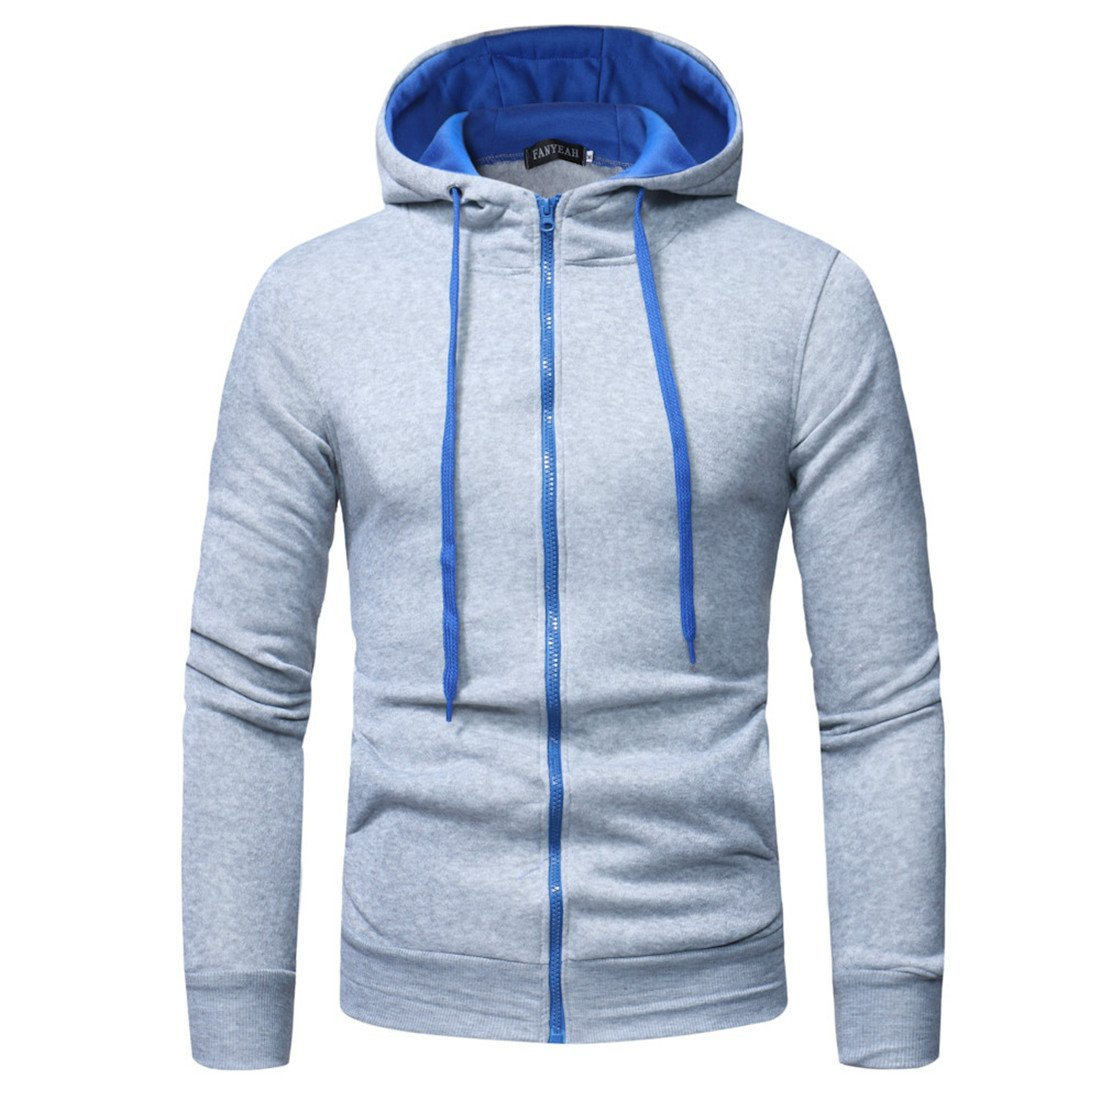 Men's Hoodie, Moonuy Men Long Sleeve Fashion Casual Daily Handsome Hooded Sweatshirt Tops Autumn Winter Jacket Coat Outwear Parka Hoody Sweater Overcoat Hoodies for Men Men' s Hoodie